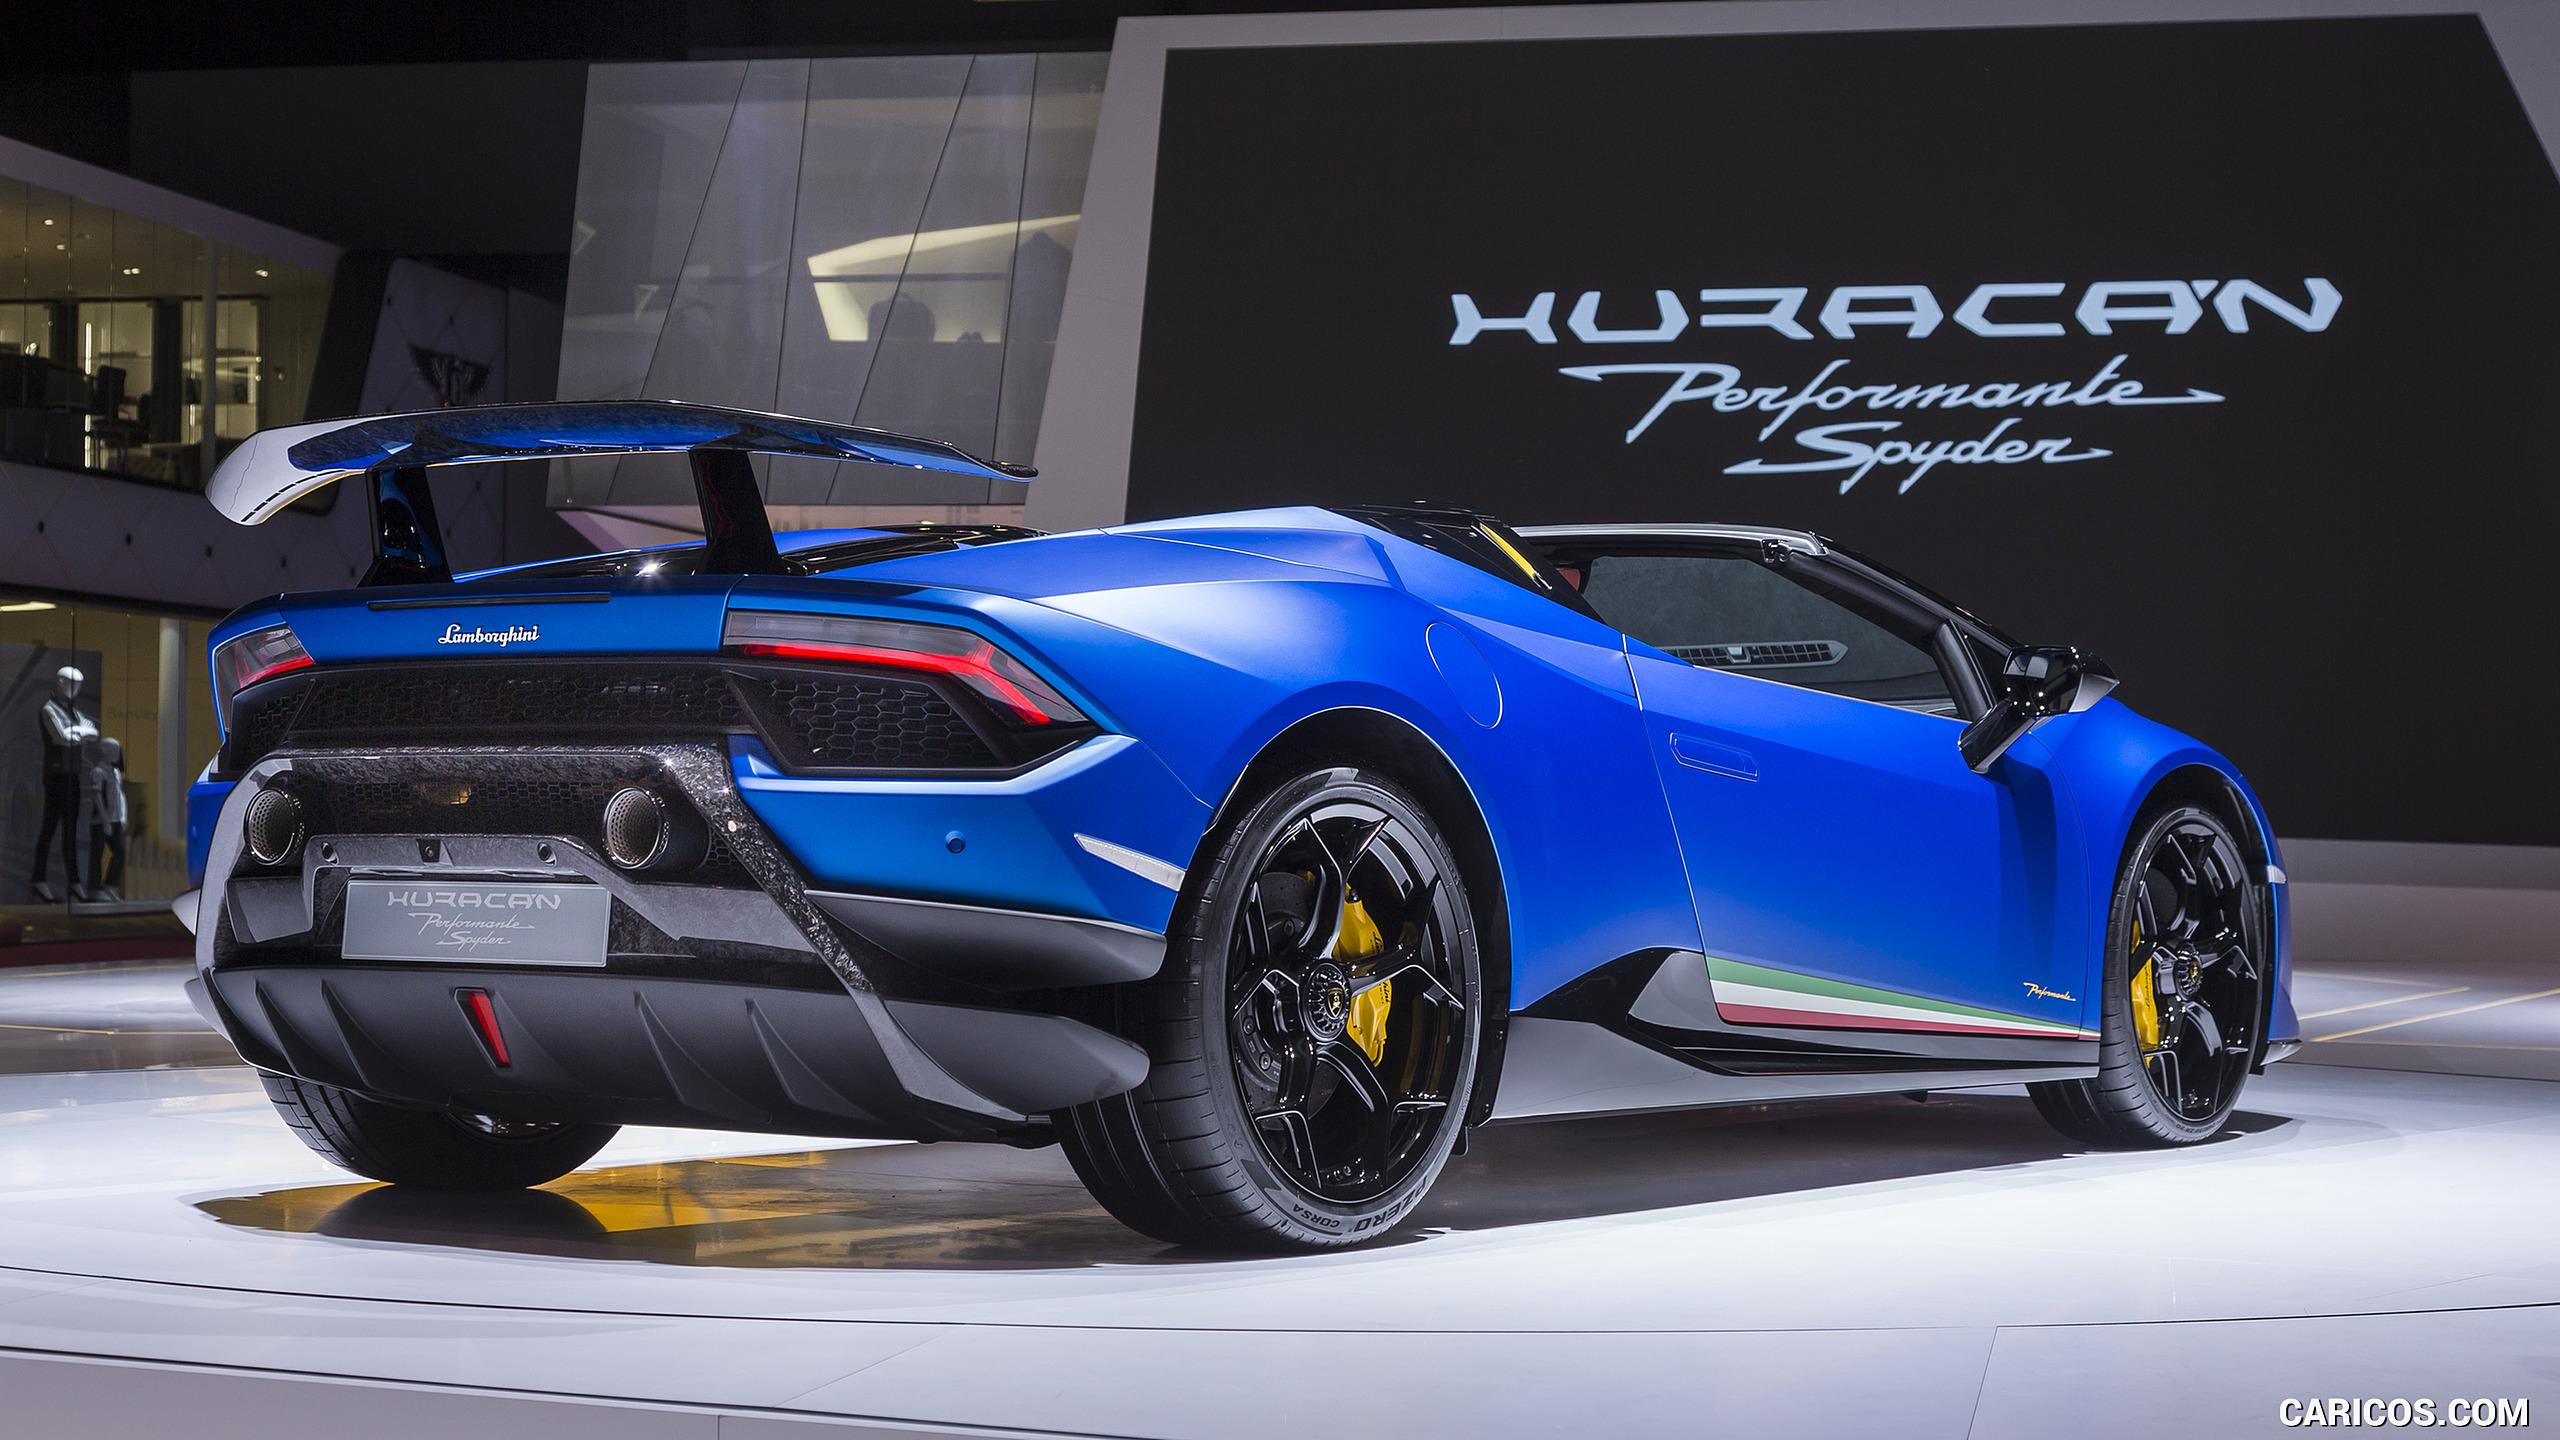 2019 Lamborghini Huracn Spyder Performante at Geneva Auto Show 2560x1440